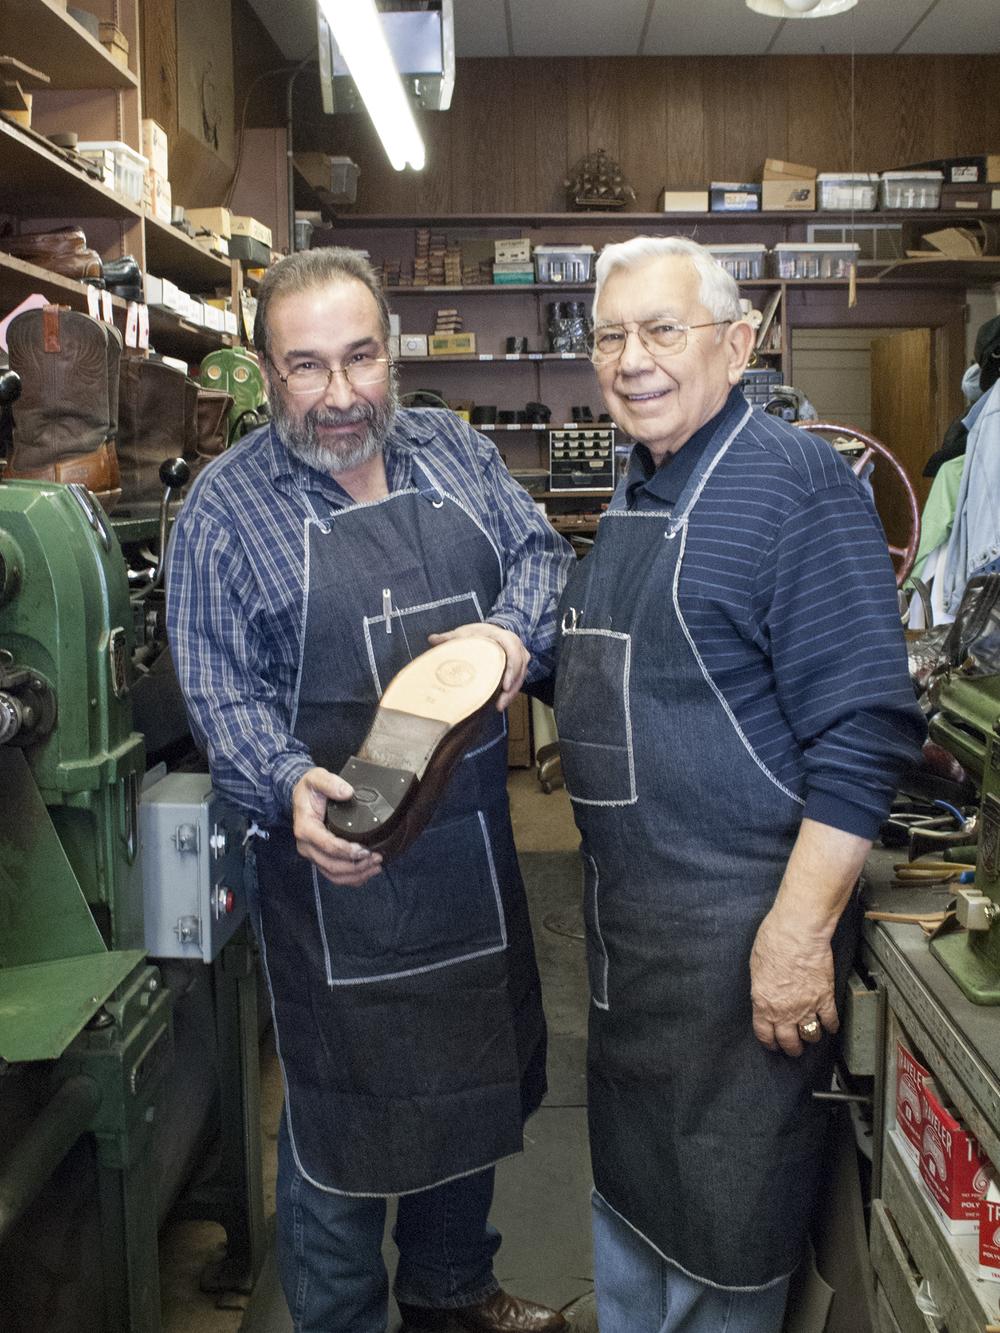 Ted and George Marinakes, shoe repair